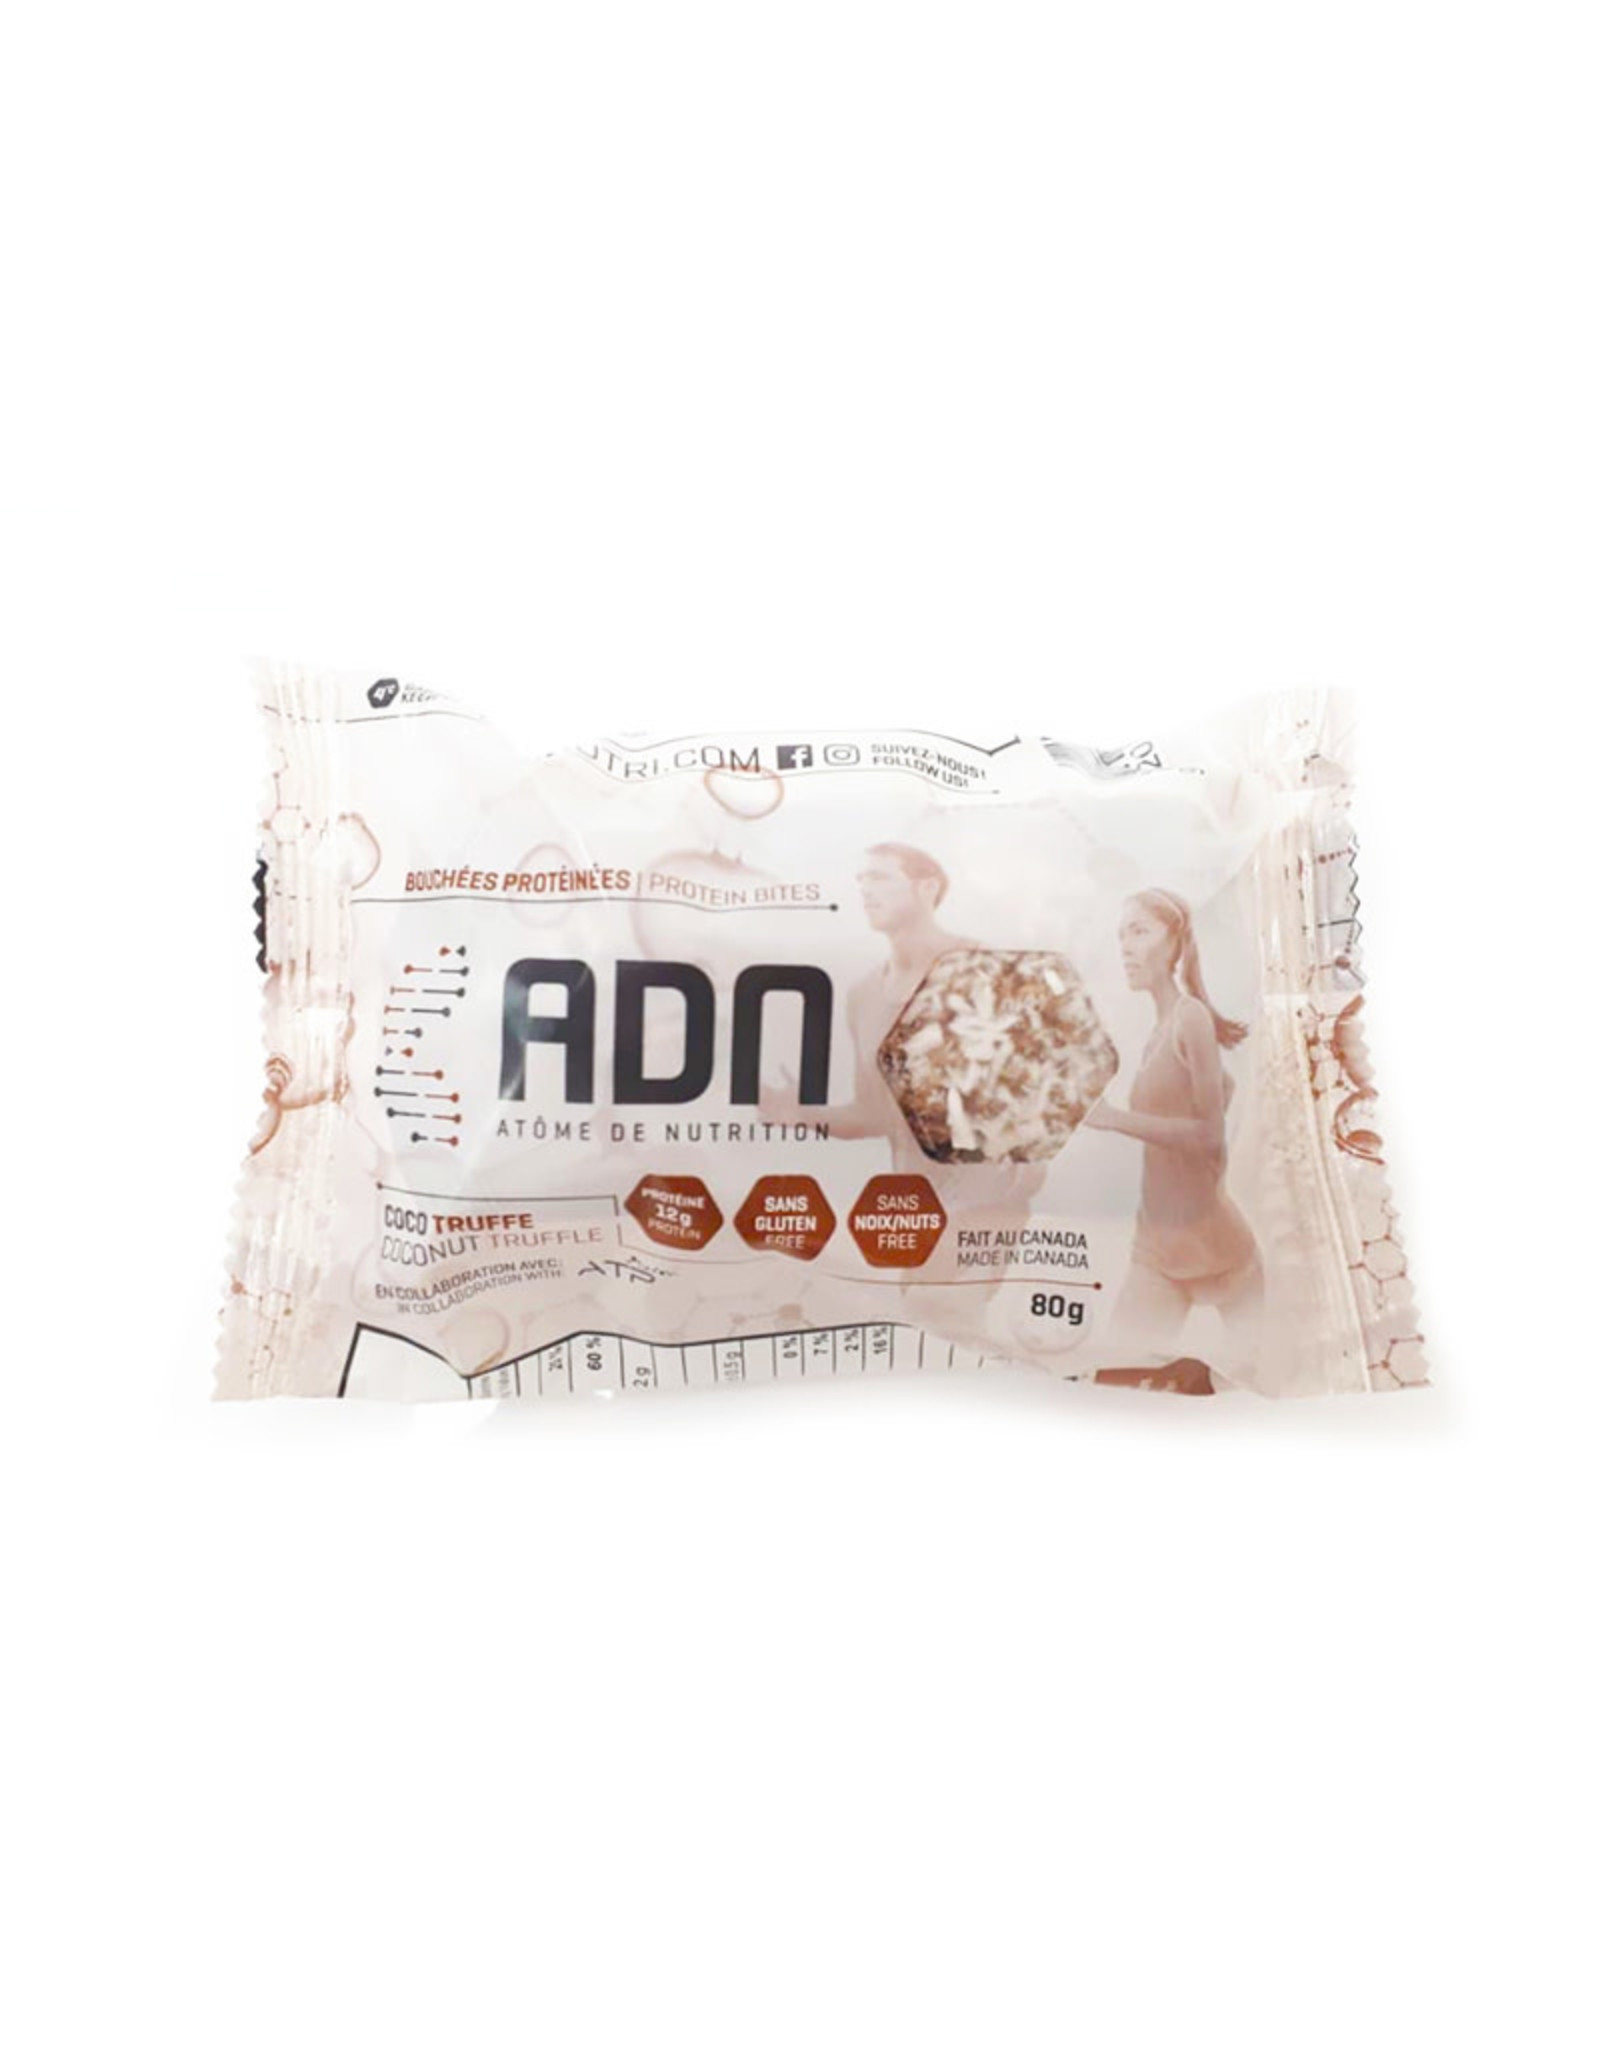 AdnNutri AdnNutri - Bouchées de Protéines, Coco Truffe (40g)